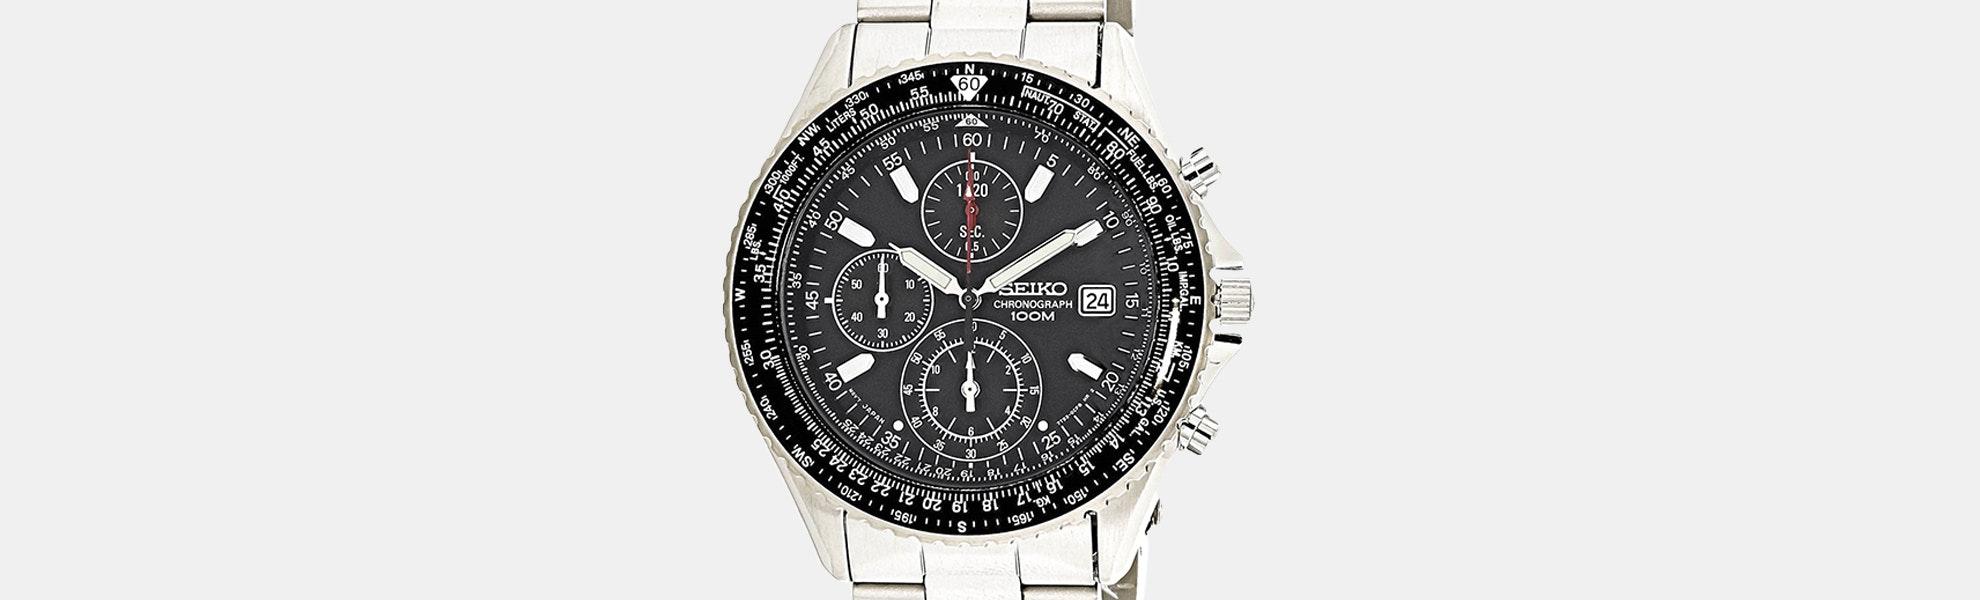 Seiko Flightmaster SND Quartz Watch